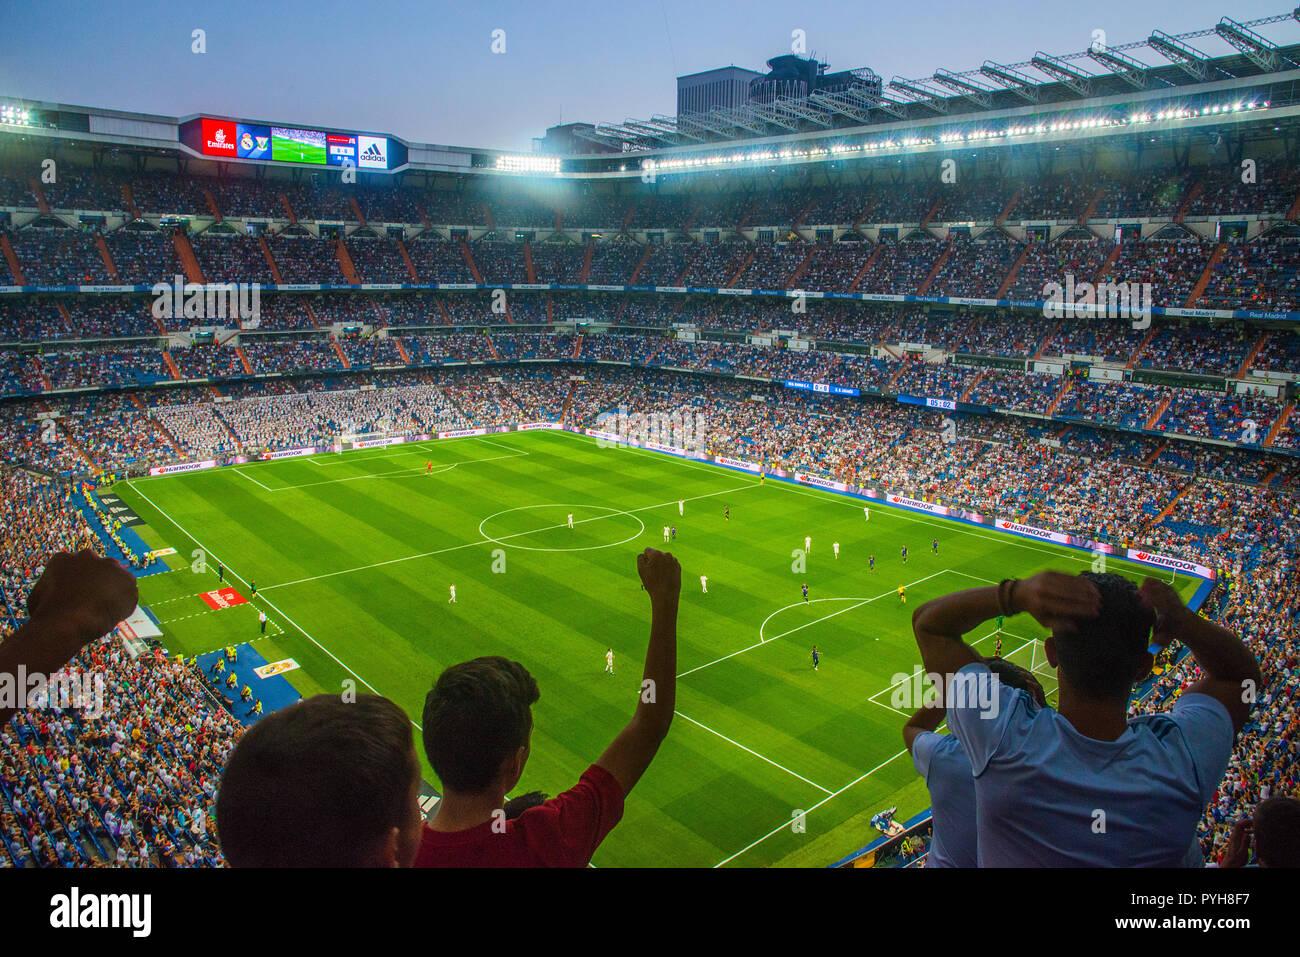 apuntalar Democracia heroína  People celebrating a goal, Real Madrid- Leganes football match. Santiago  Bernabeu stadium, Madrid, Spain Stock Photo - Alamy